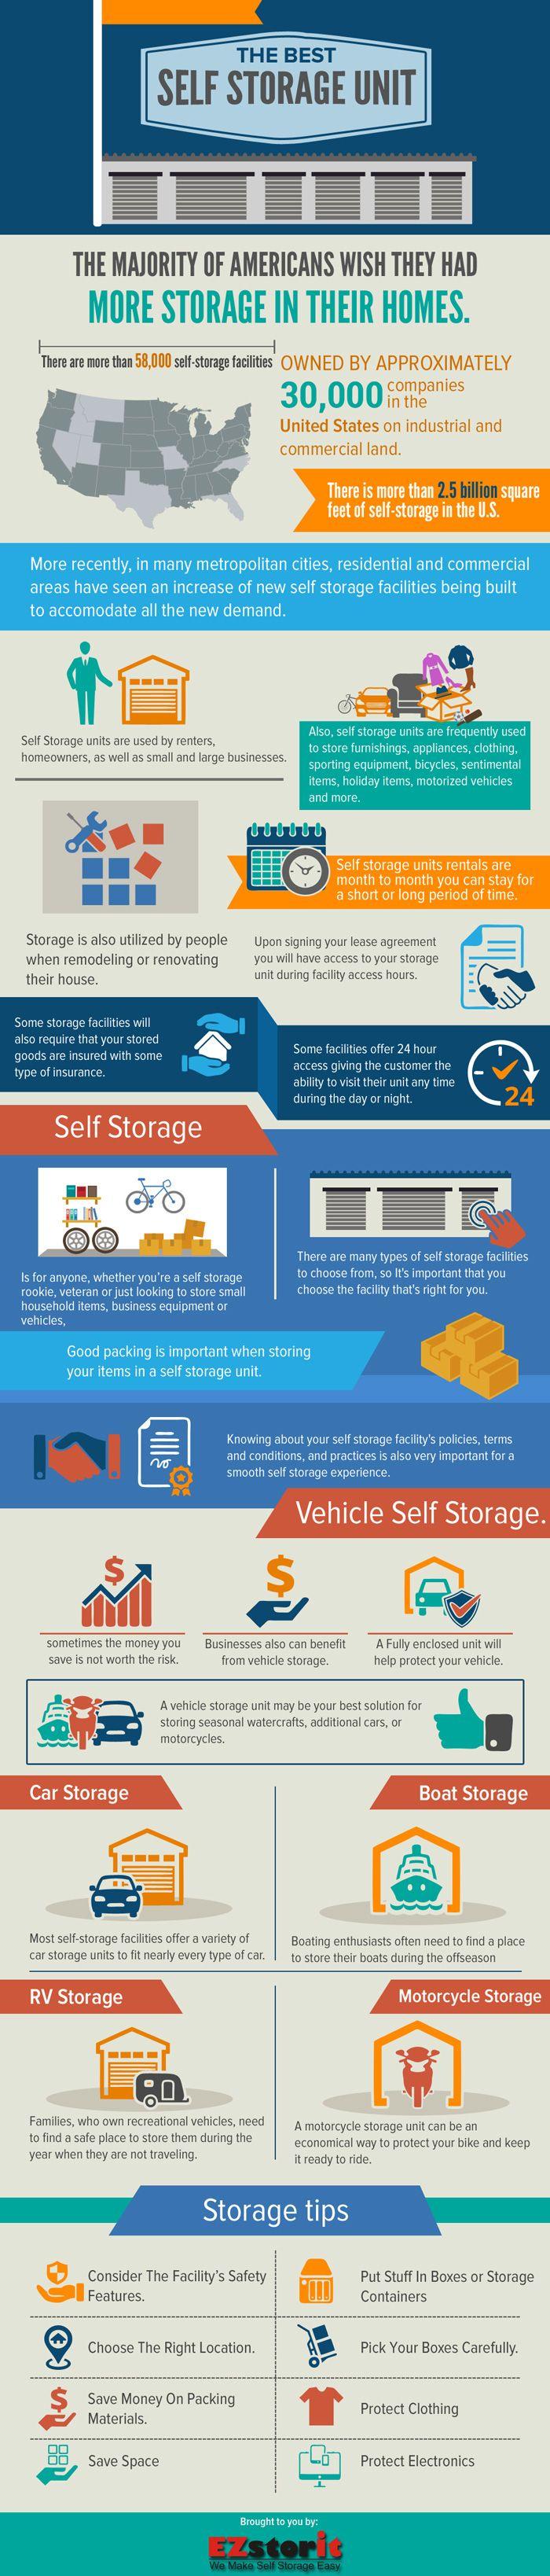 Self Storage Units In The Us Ezstorit Com Self Storage Units Self Storage Cube Storage